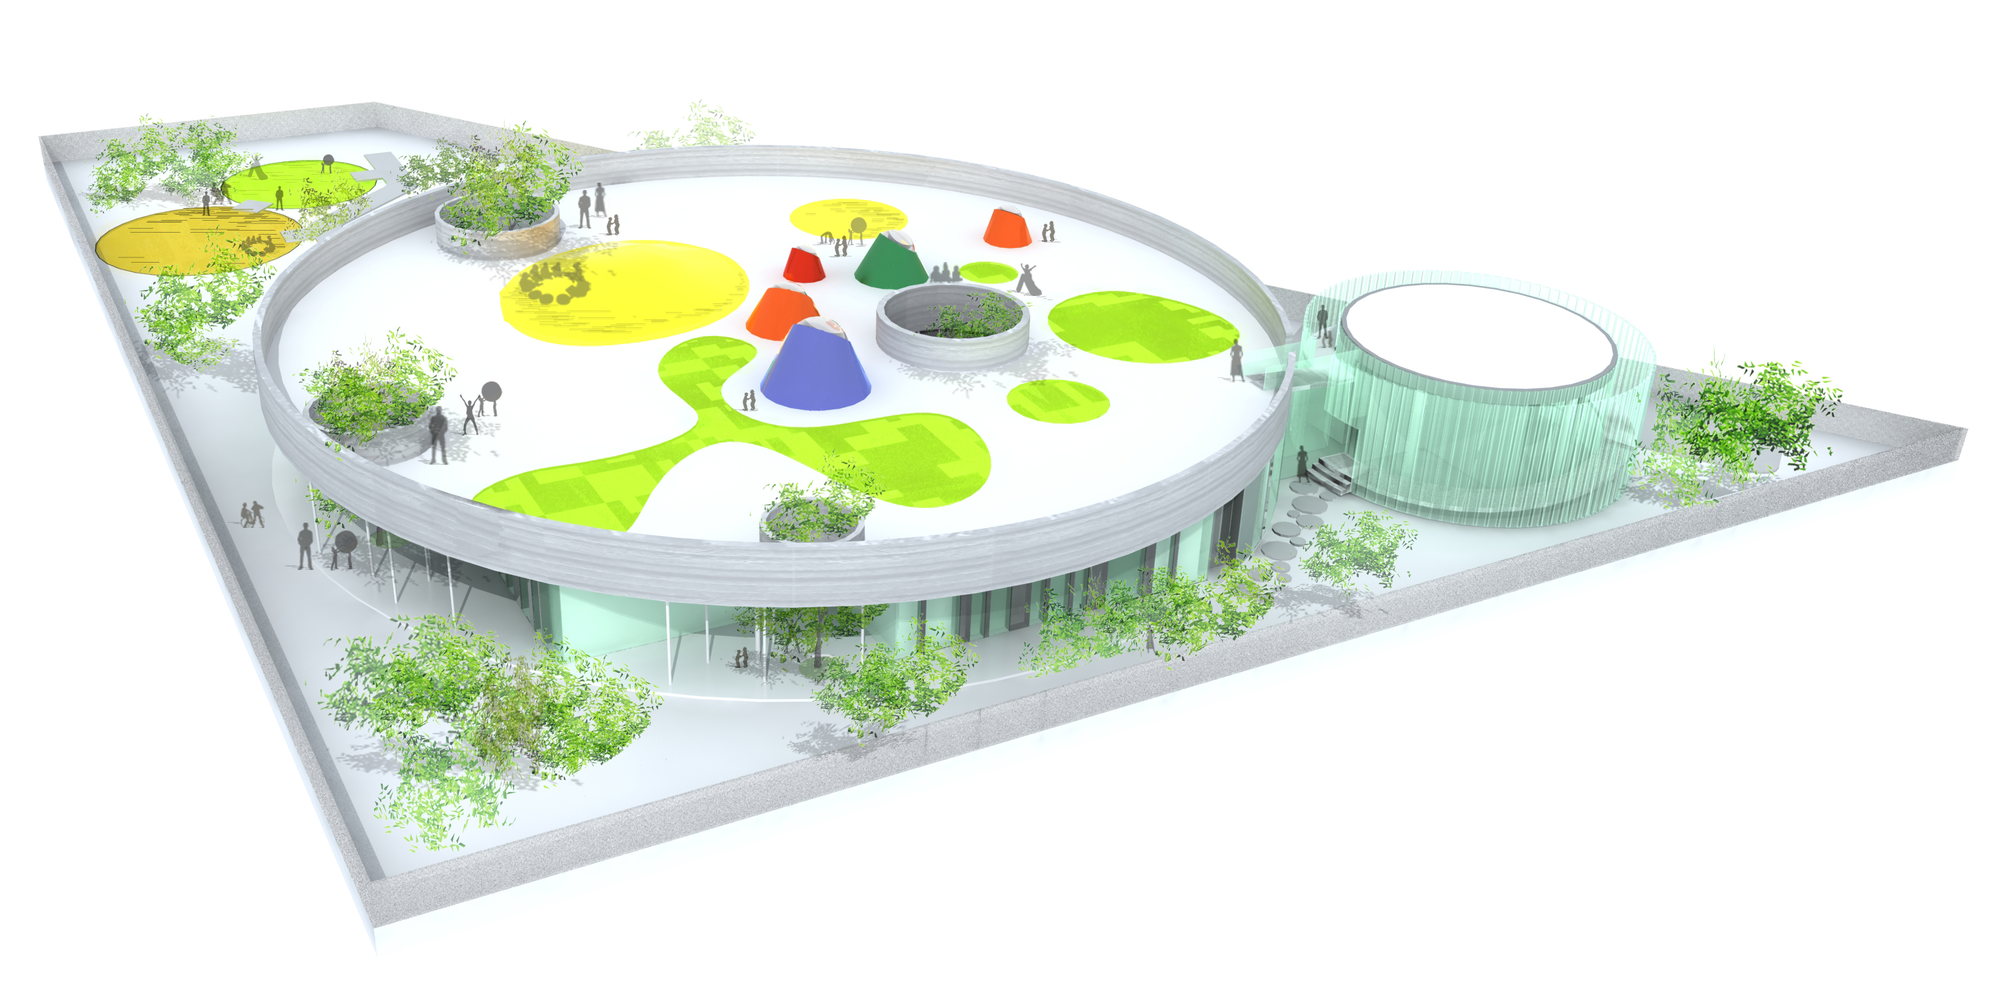 http://ad009cdnb.archdaily.net/wp-content/uploads/2013/04/5168970cb3fc4bdb4e00003f_infant-school-student-in-vereda-rueda-pizarro-arquitectos_diagram_-1-.png